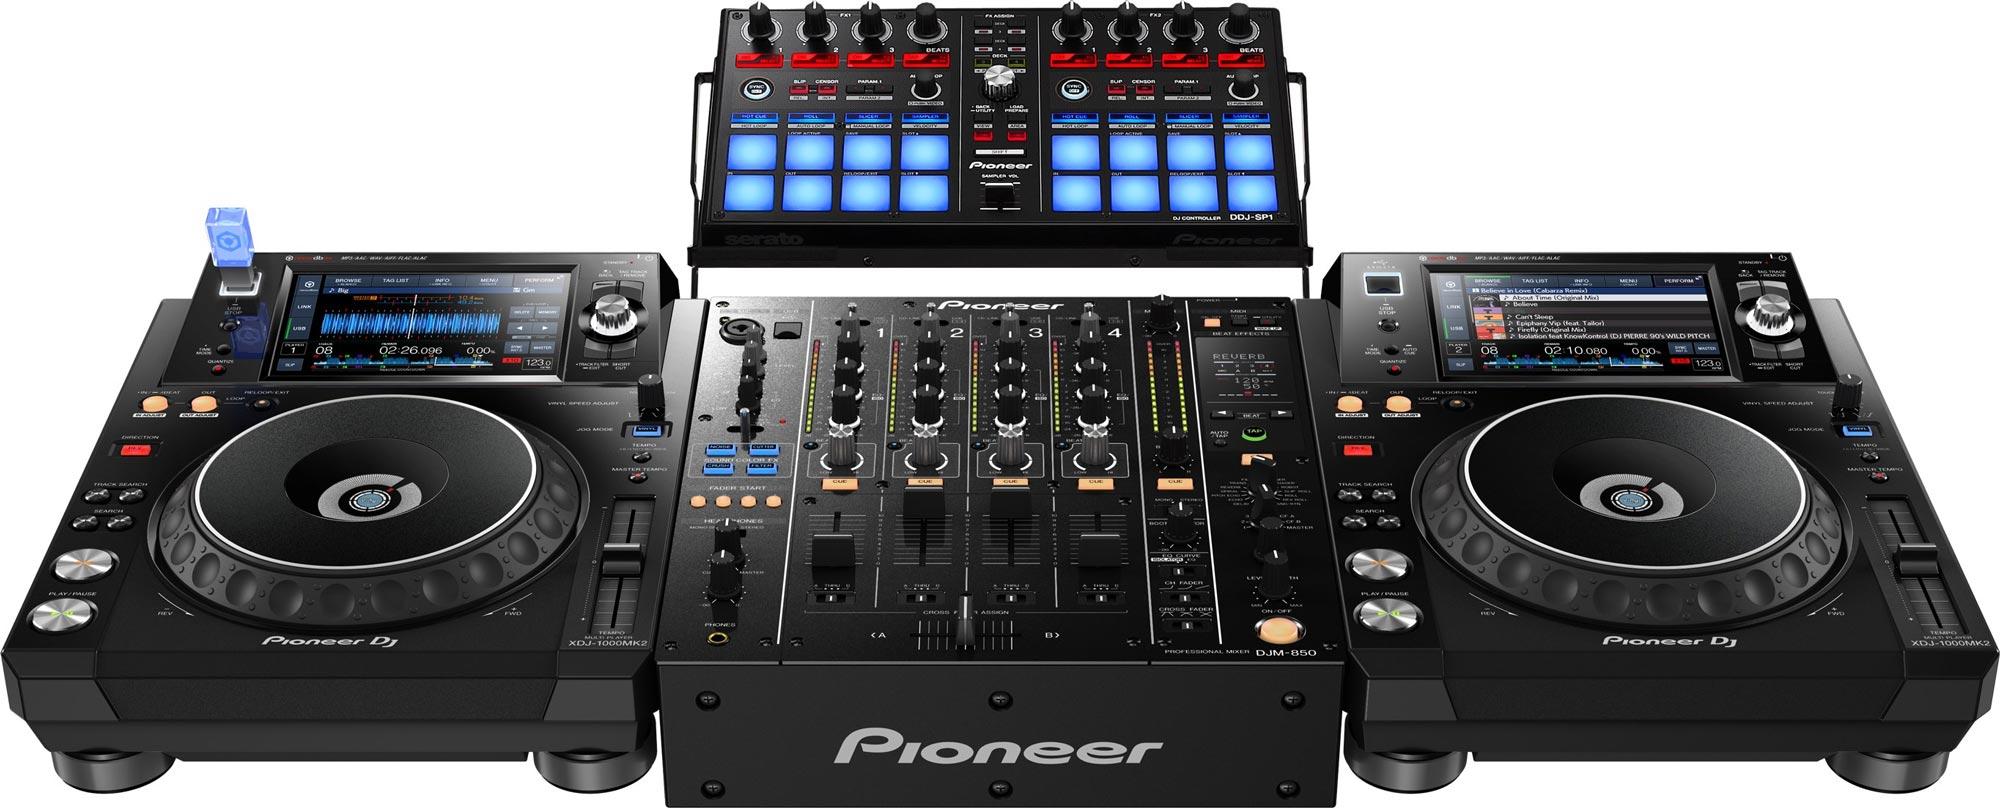 Pioneer Xdj 1000mk2 Rekordbox Digital Performance Multi